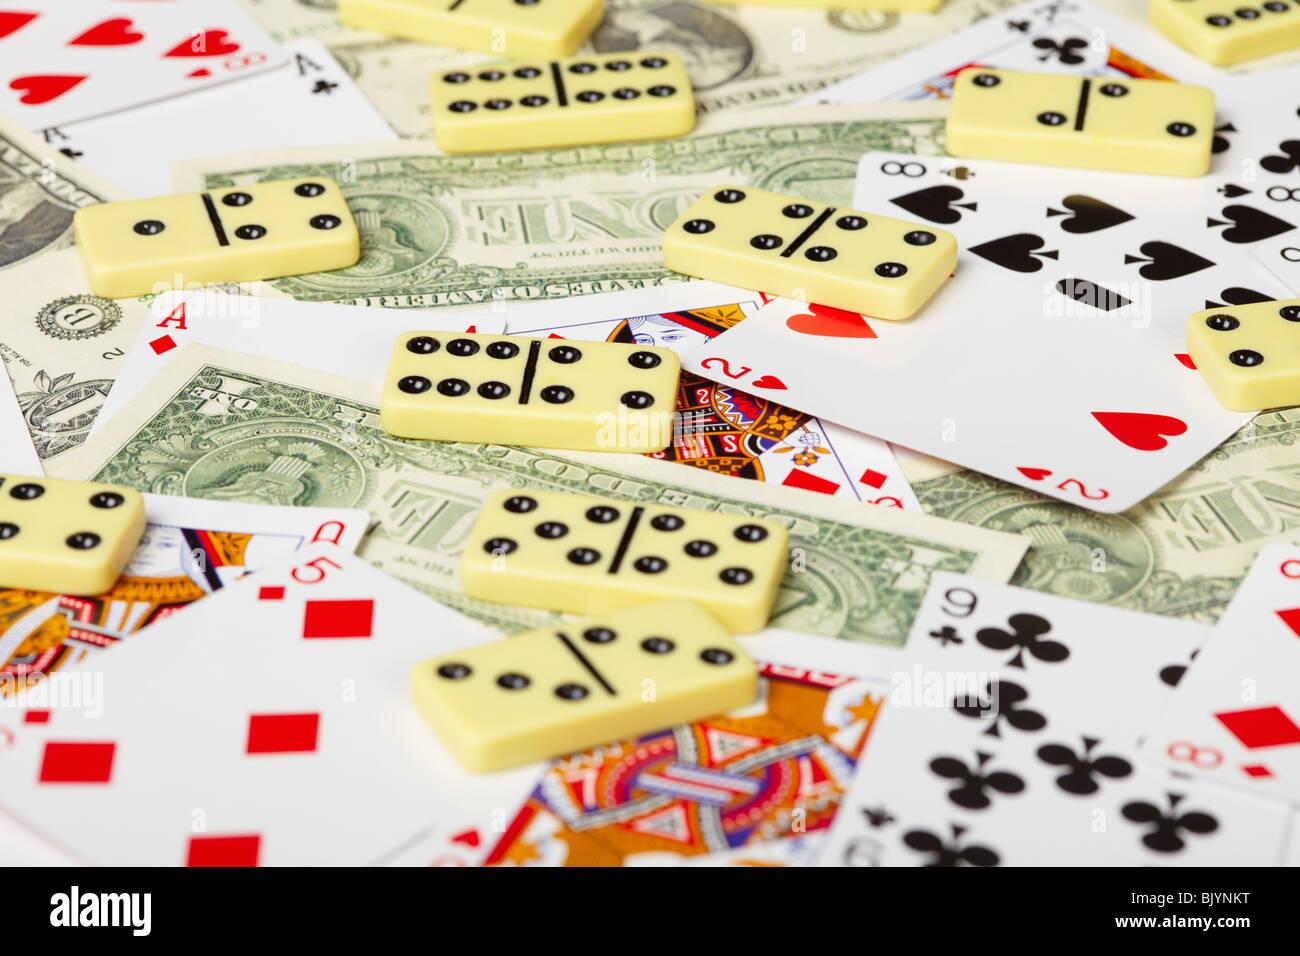 Dominoes gambling barona casino poker room